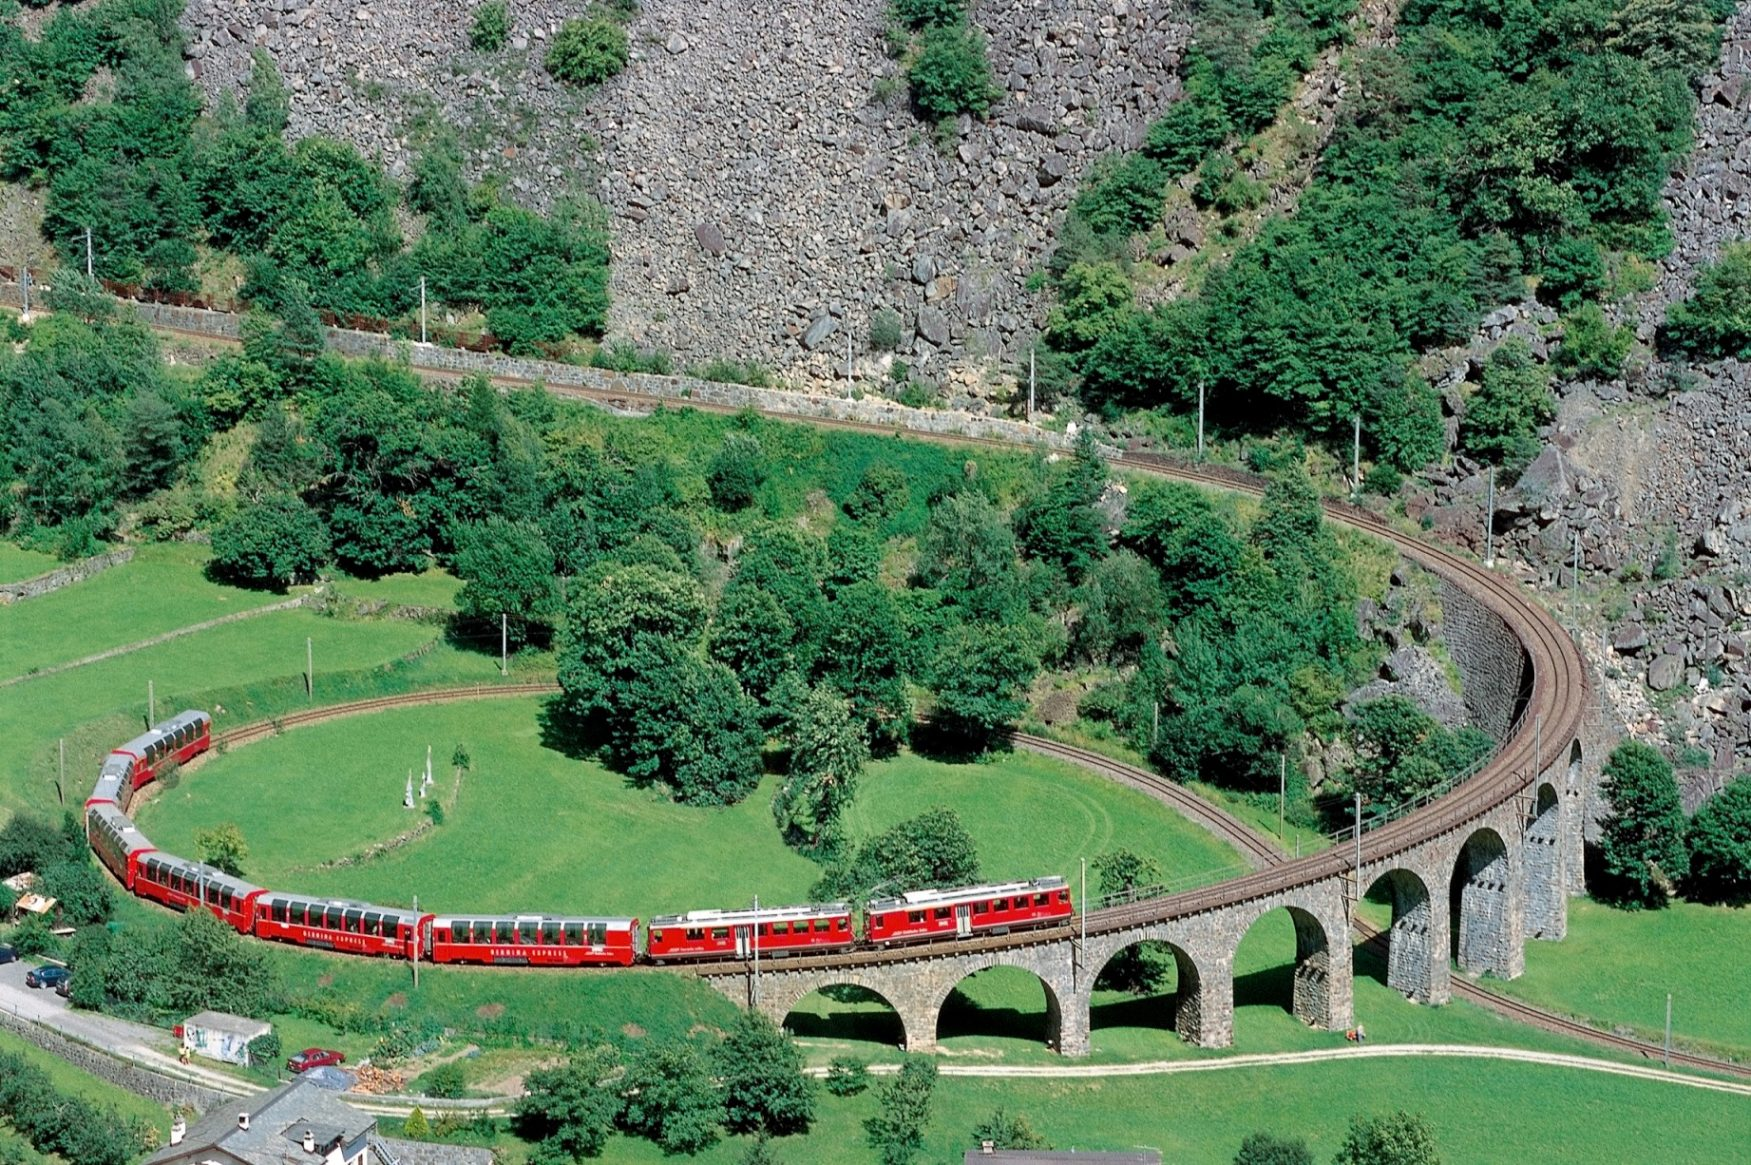 Rhaetische BahnBerninaExpressFoto: Rhaetische Bahn